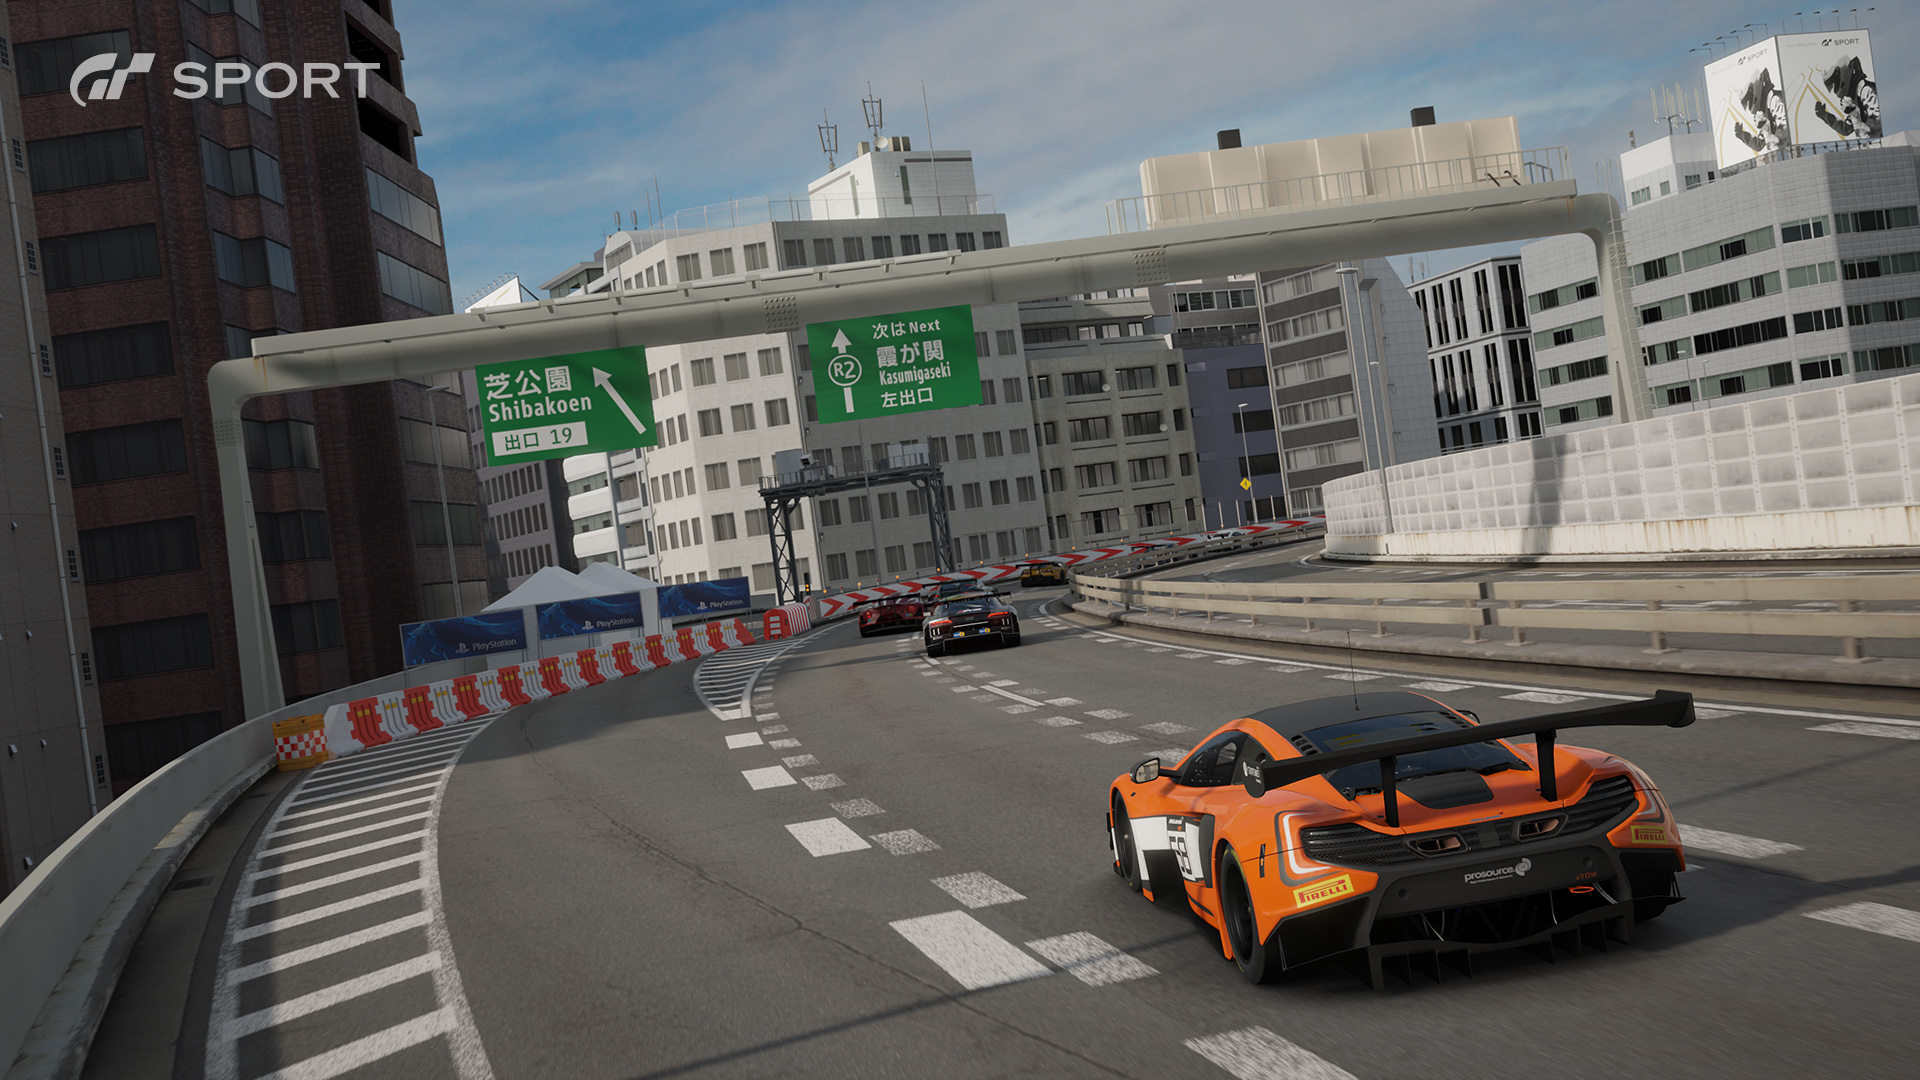 GTSport - Race Tokyo Express way - McLaren